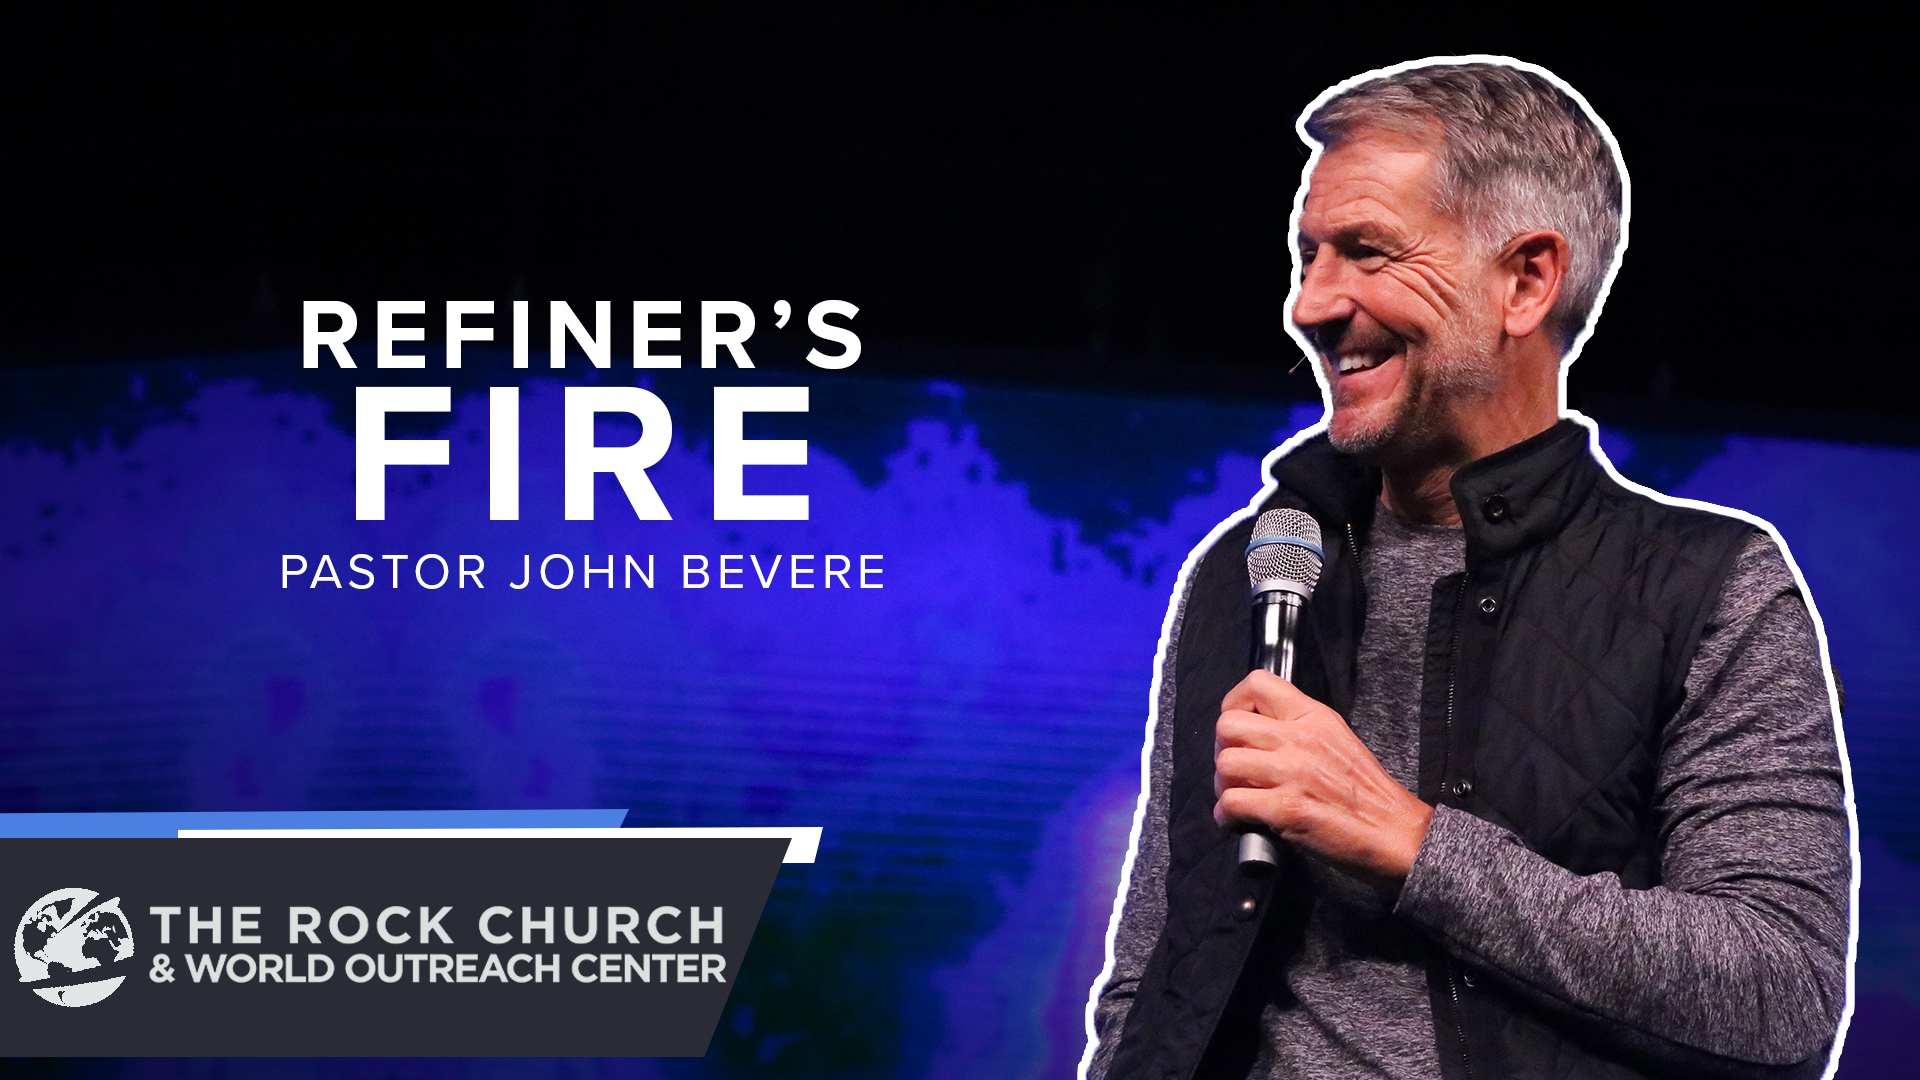 Watch Refiner's Fire